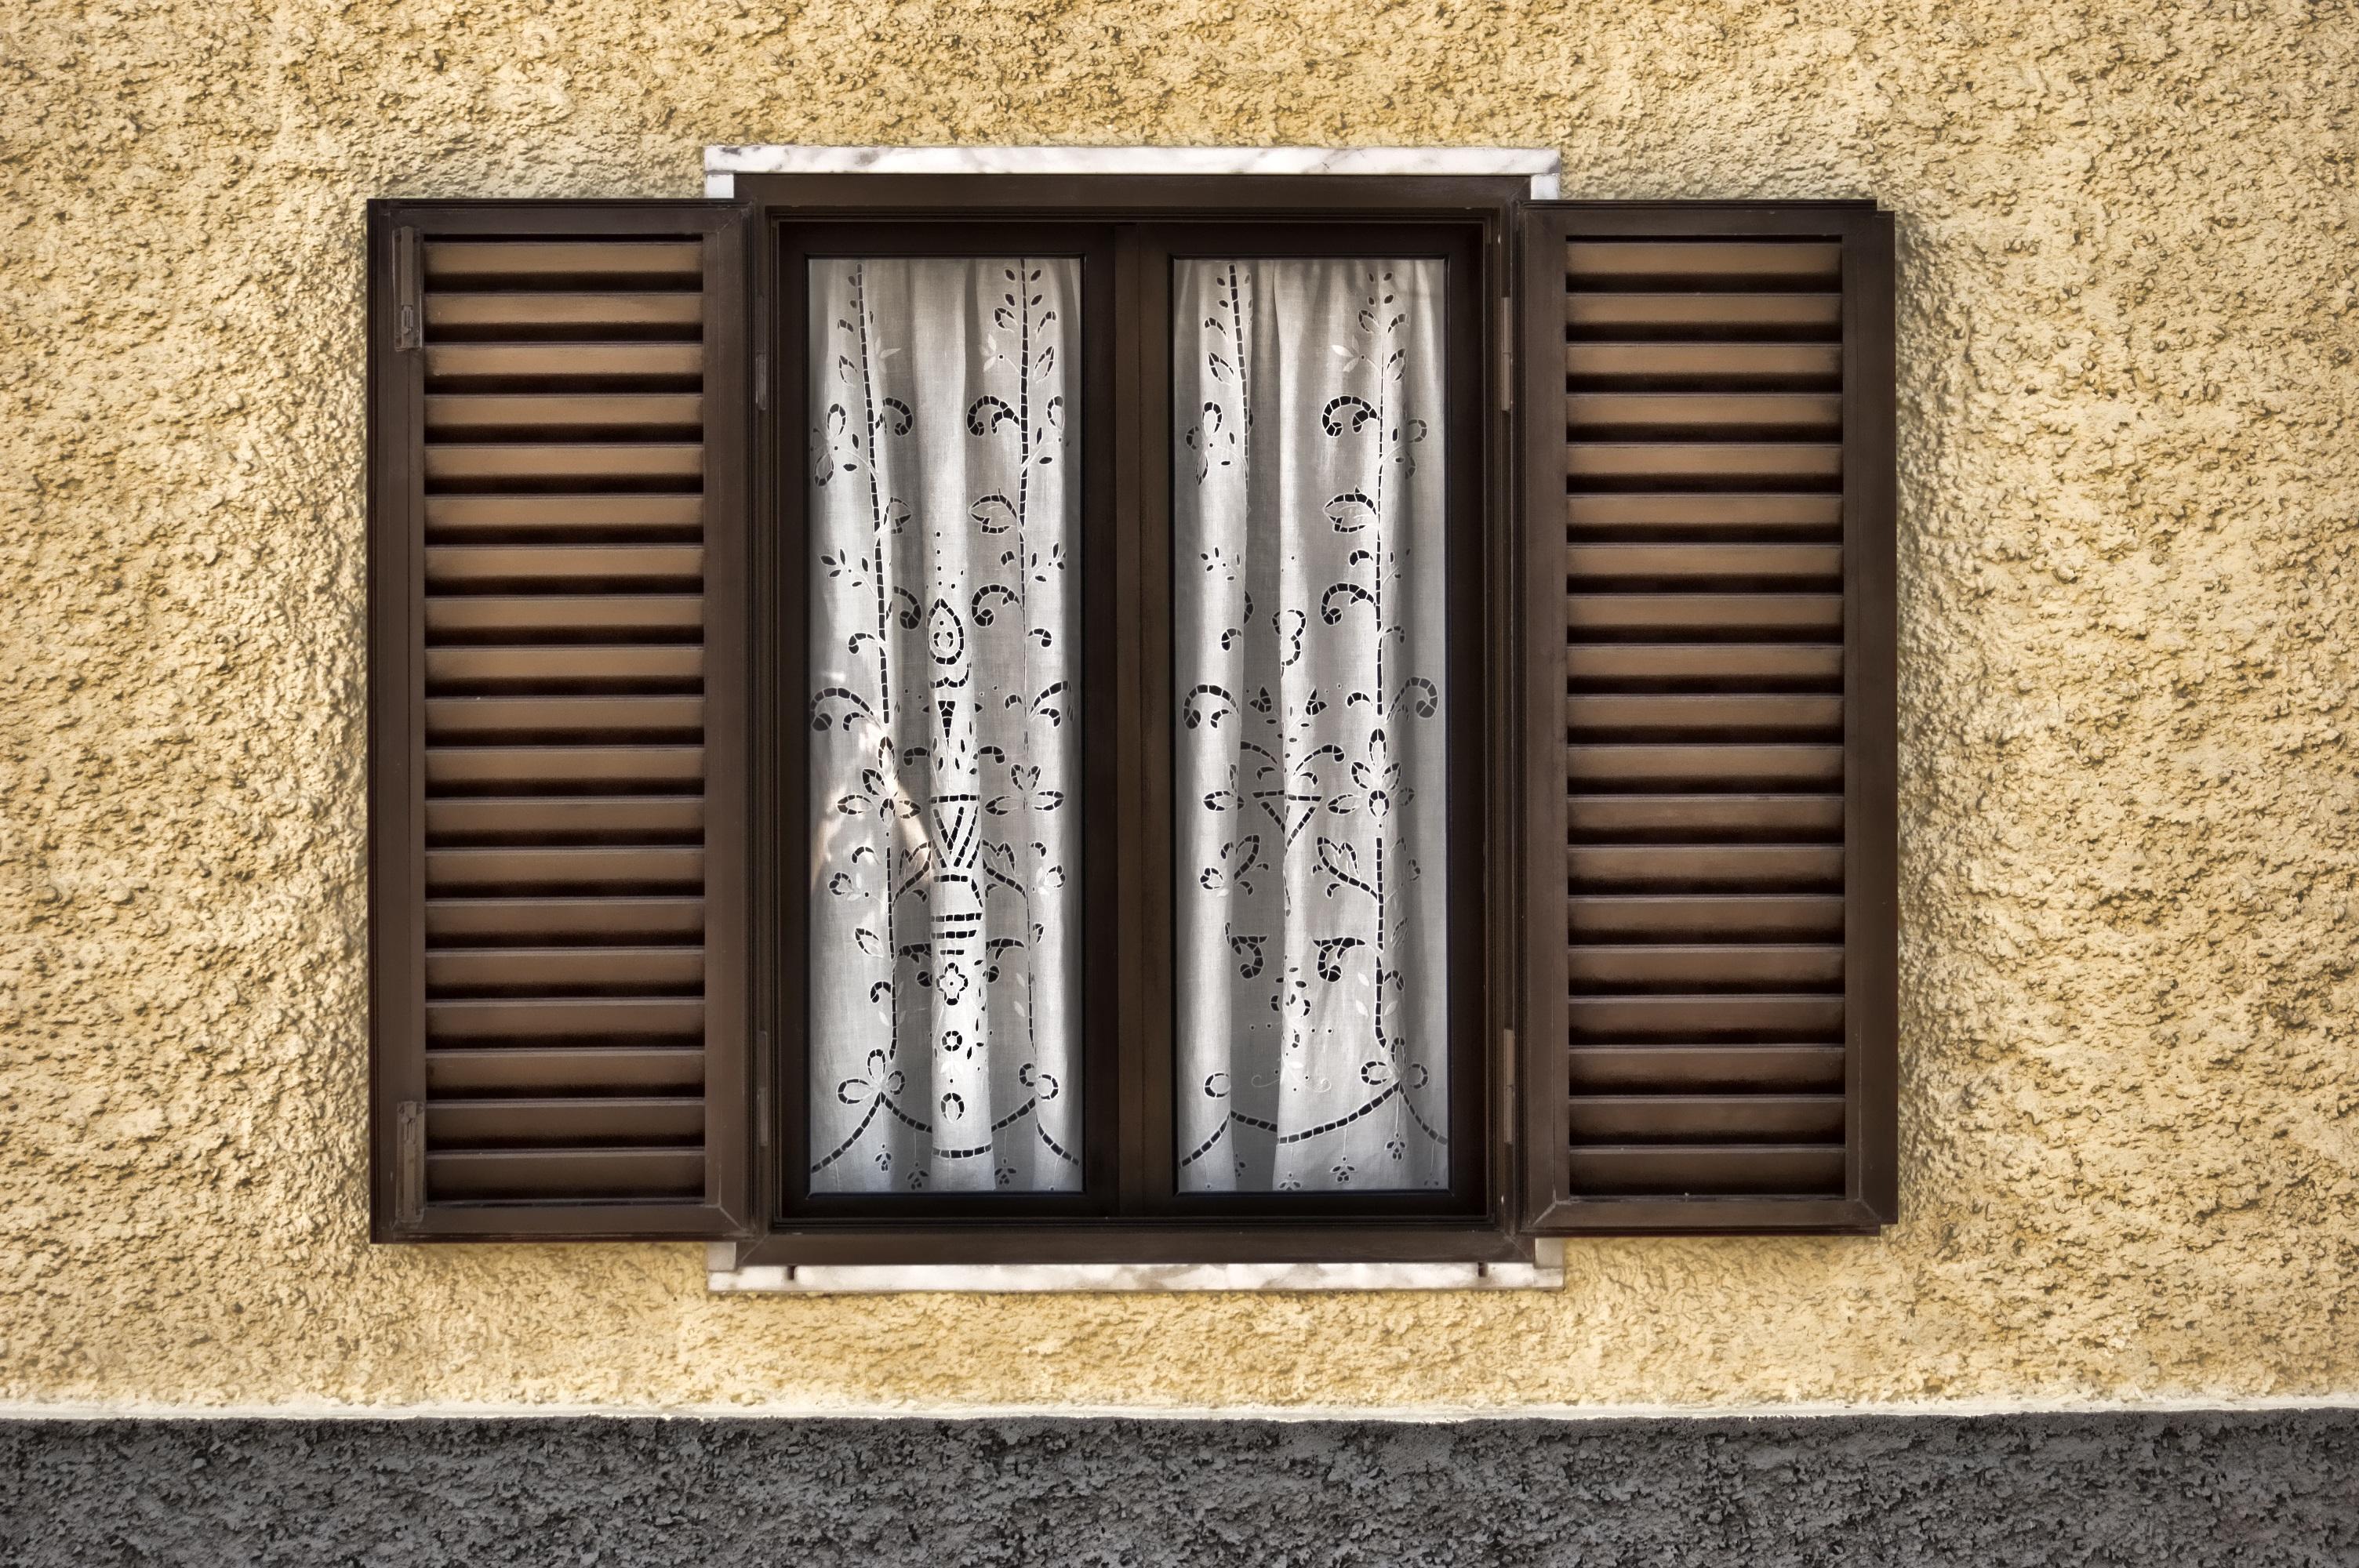 Fotos gratis : madera, casa, pared, amarillo, iluminación, puerta ...